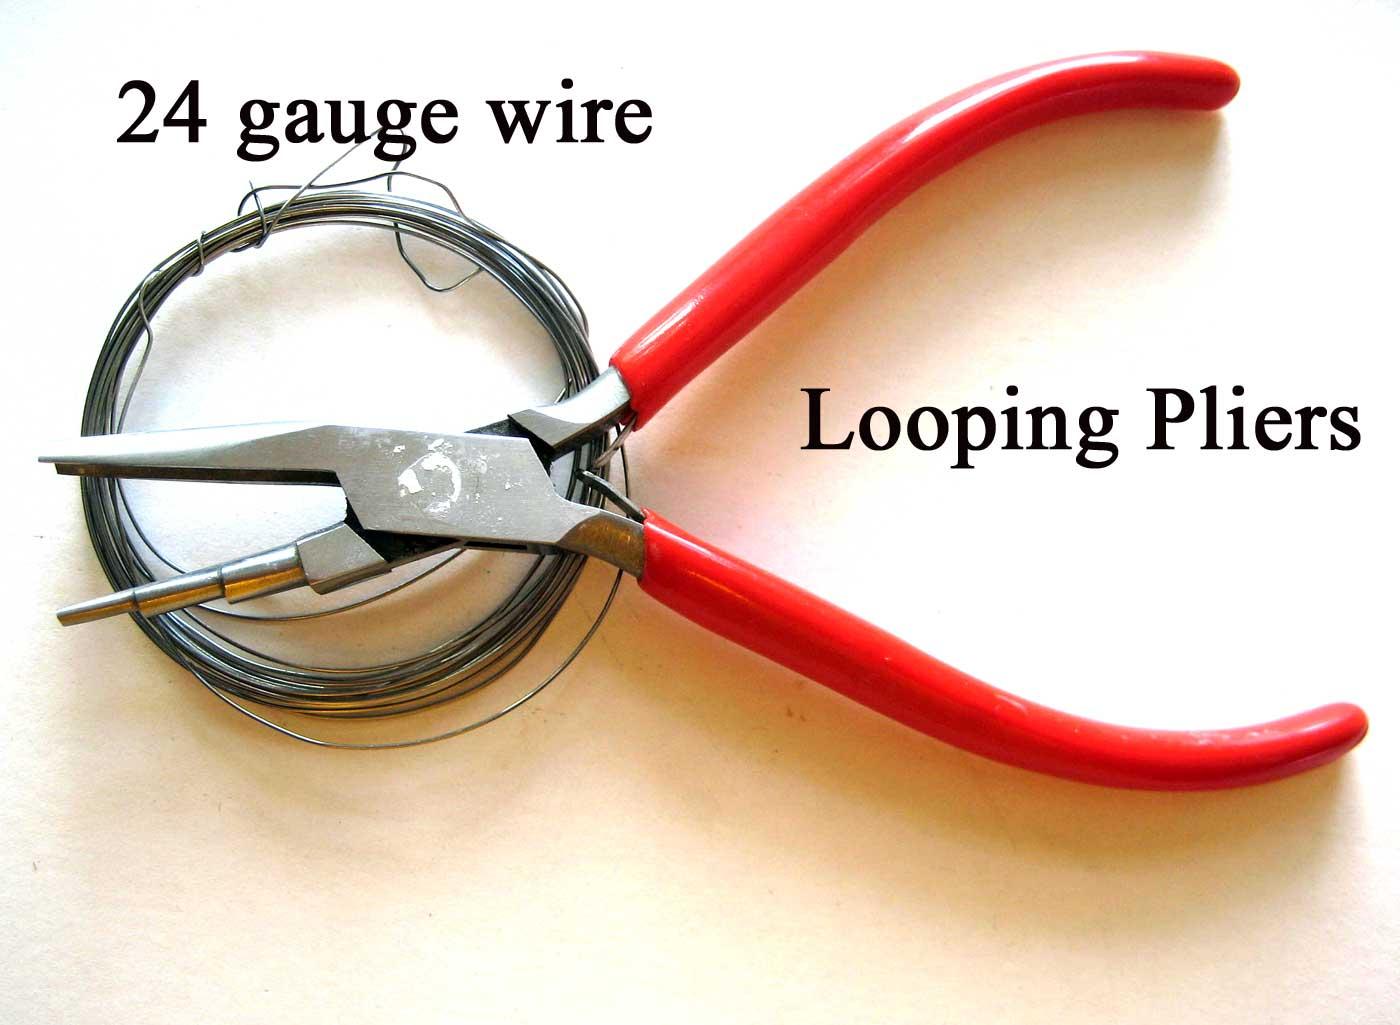 Beads of Clay Blog: Tool Talk Thursday High Temp Wire